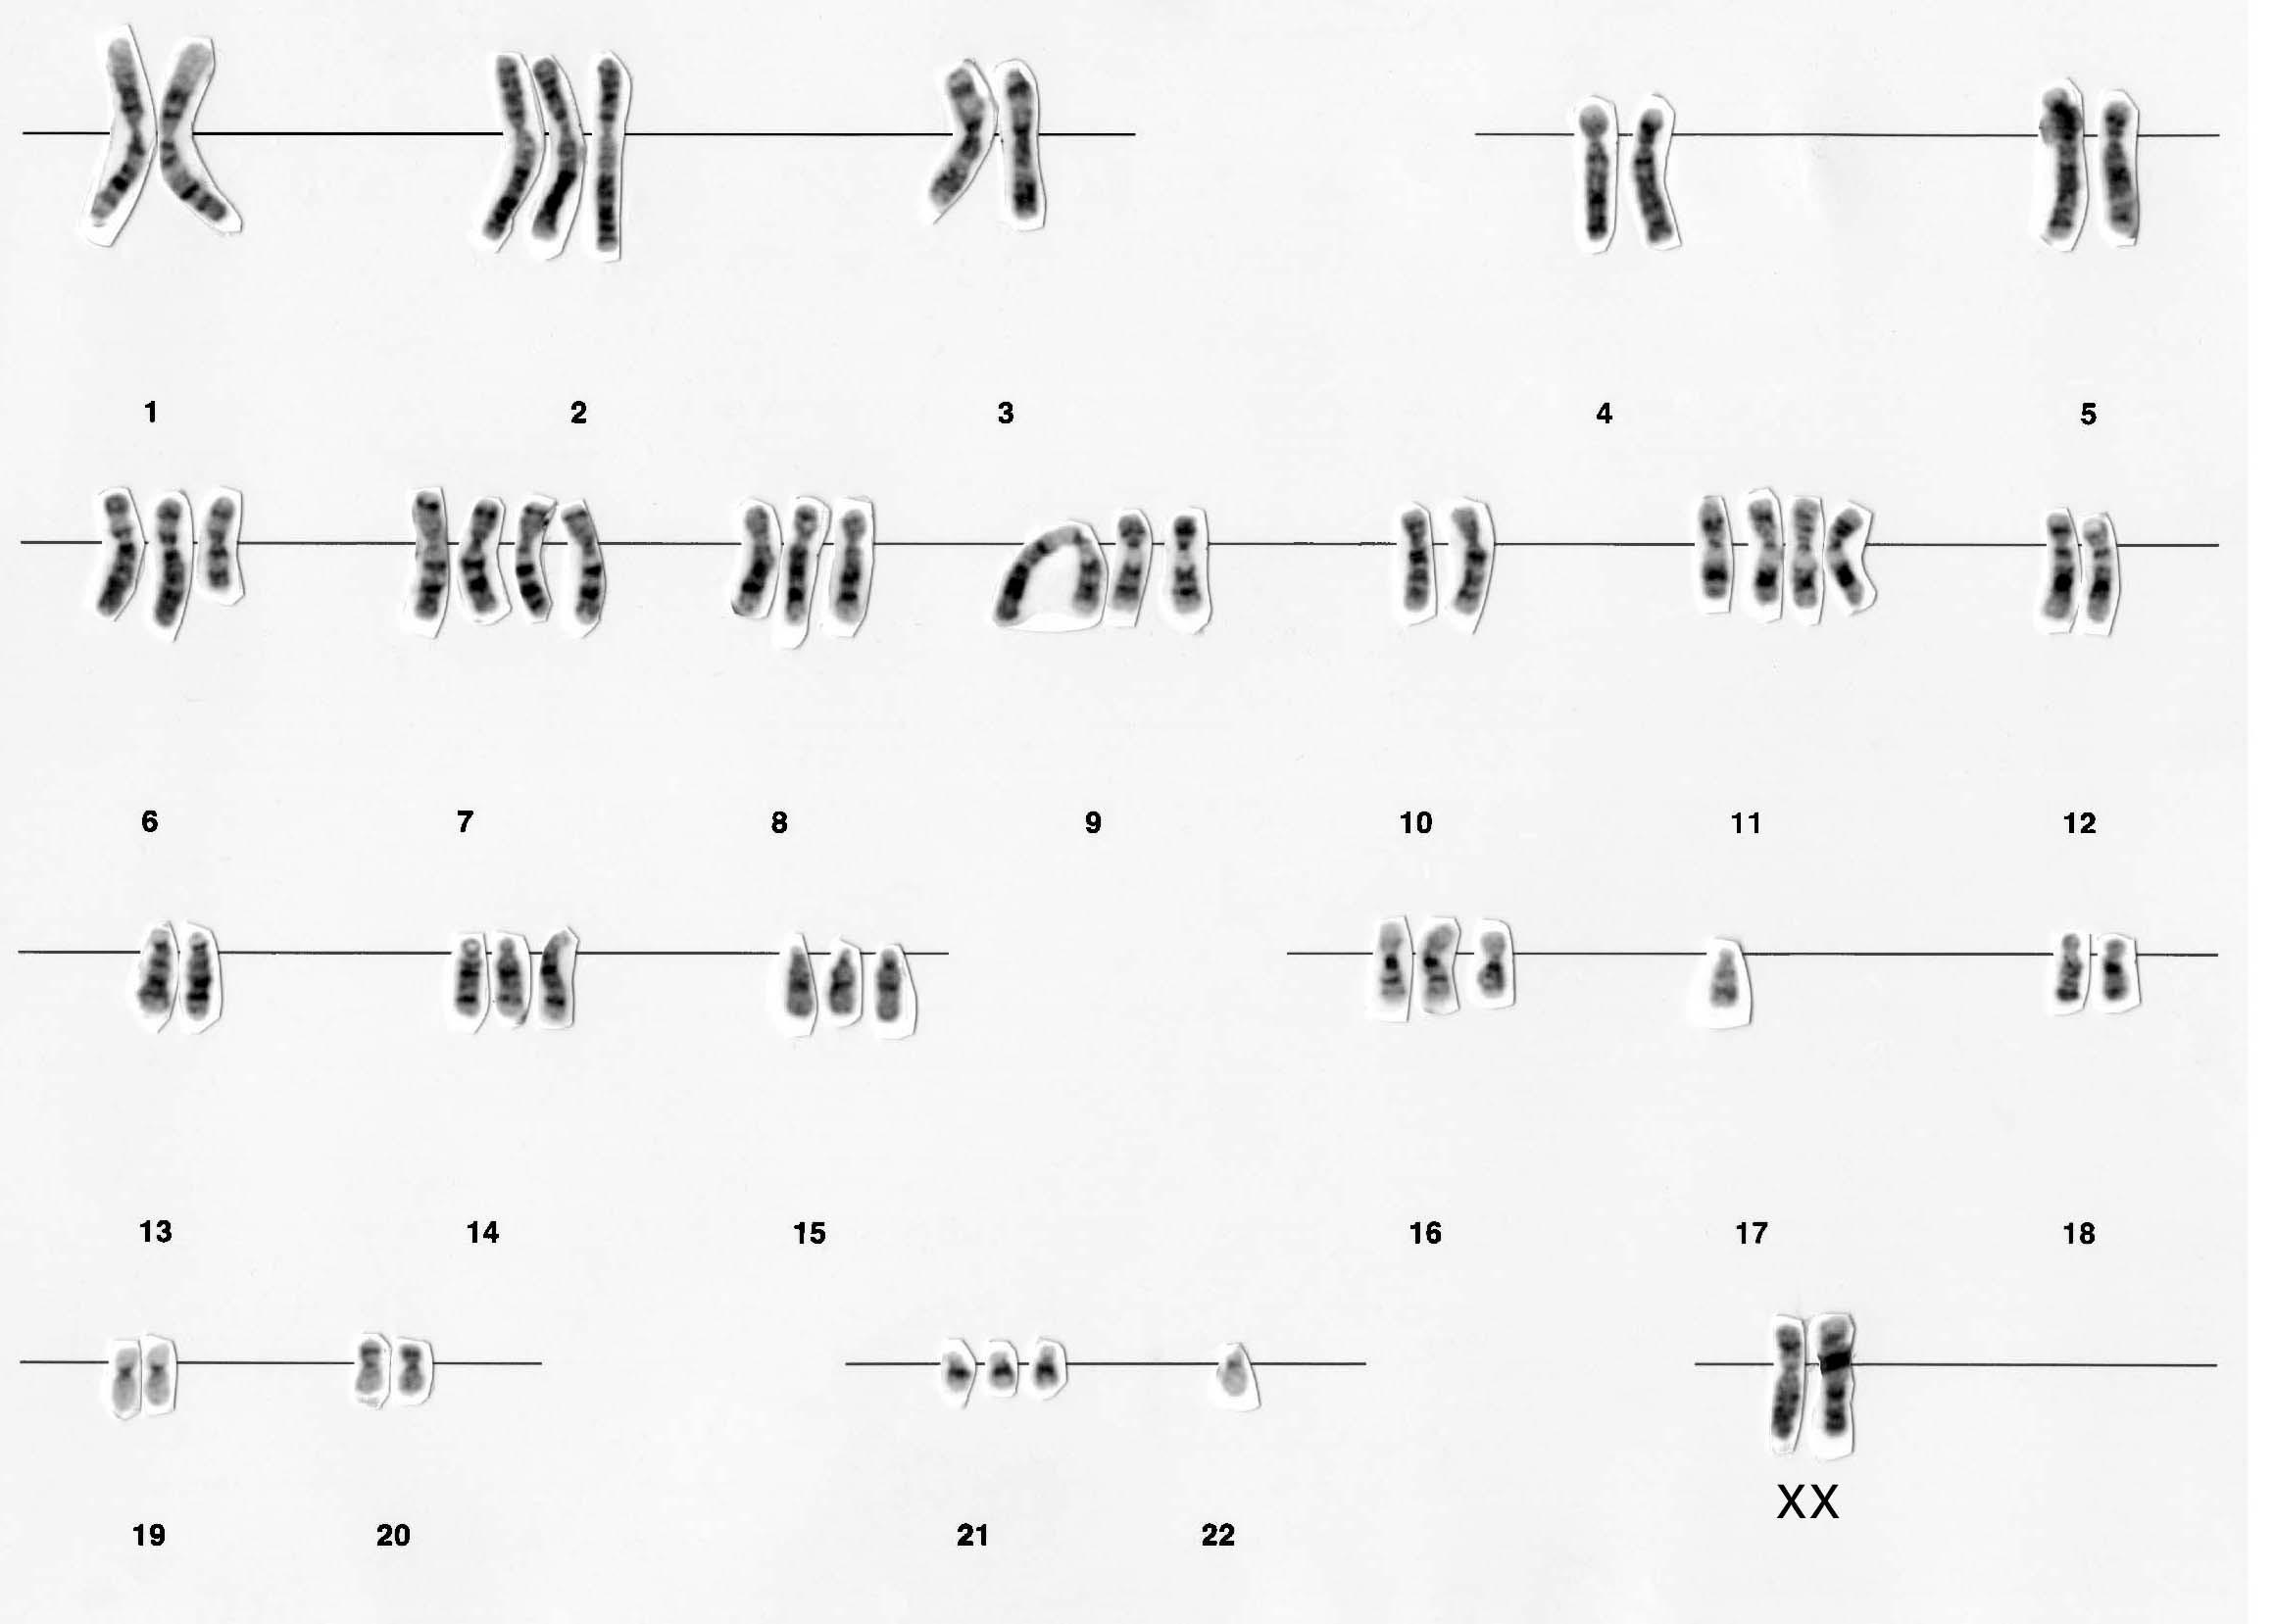 Caryotype de cellule cancéreuse d'un être humain.